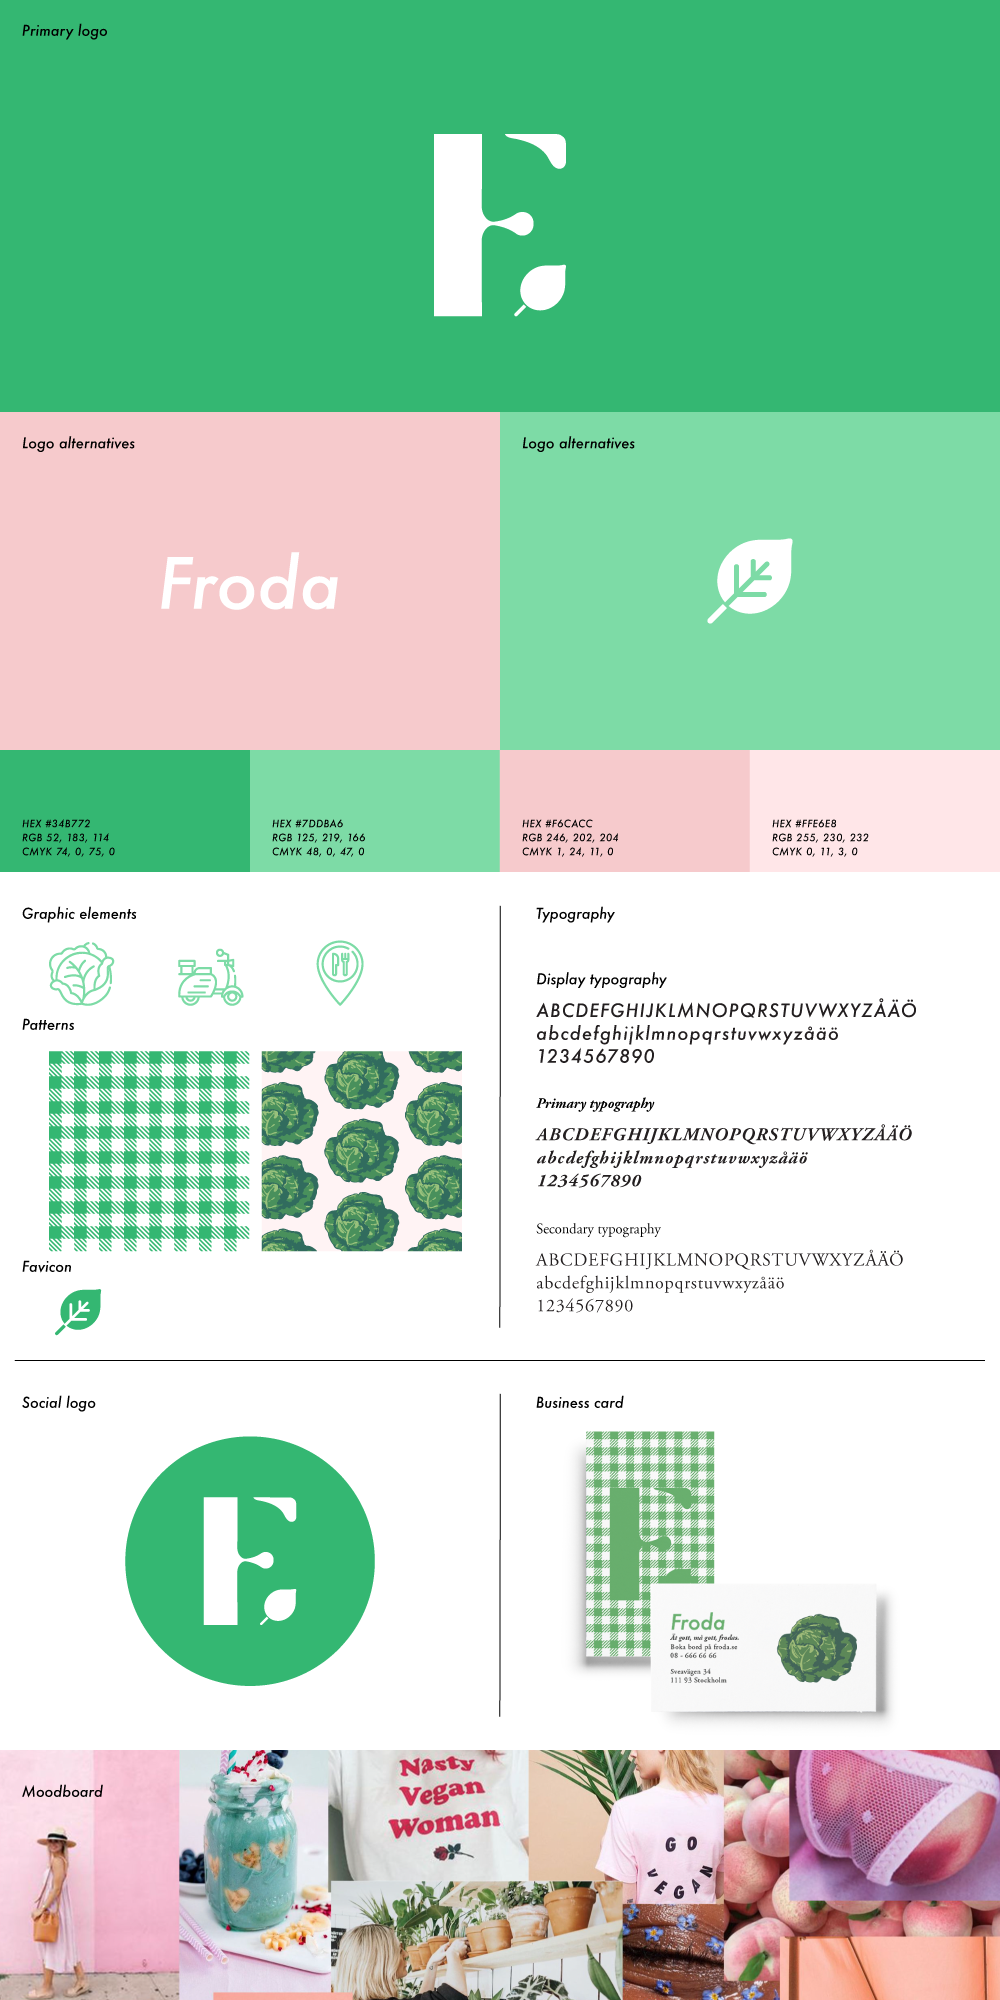 Jennis-Prints-Graphic-Design-Froda-brand-identity